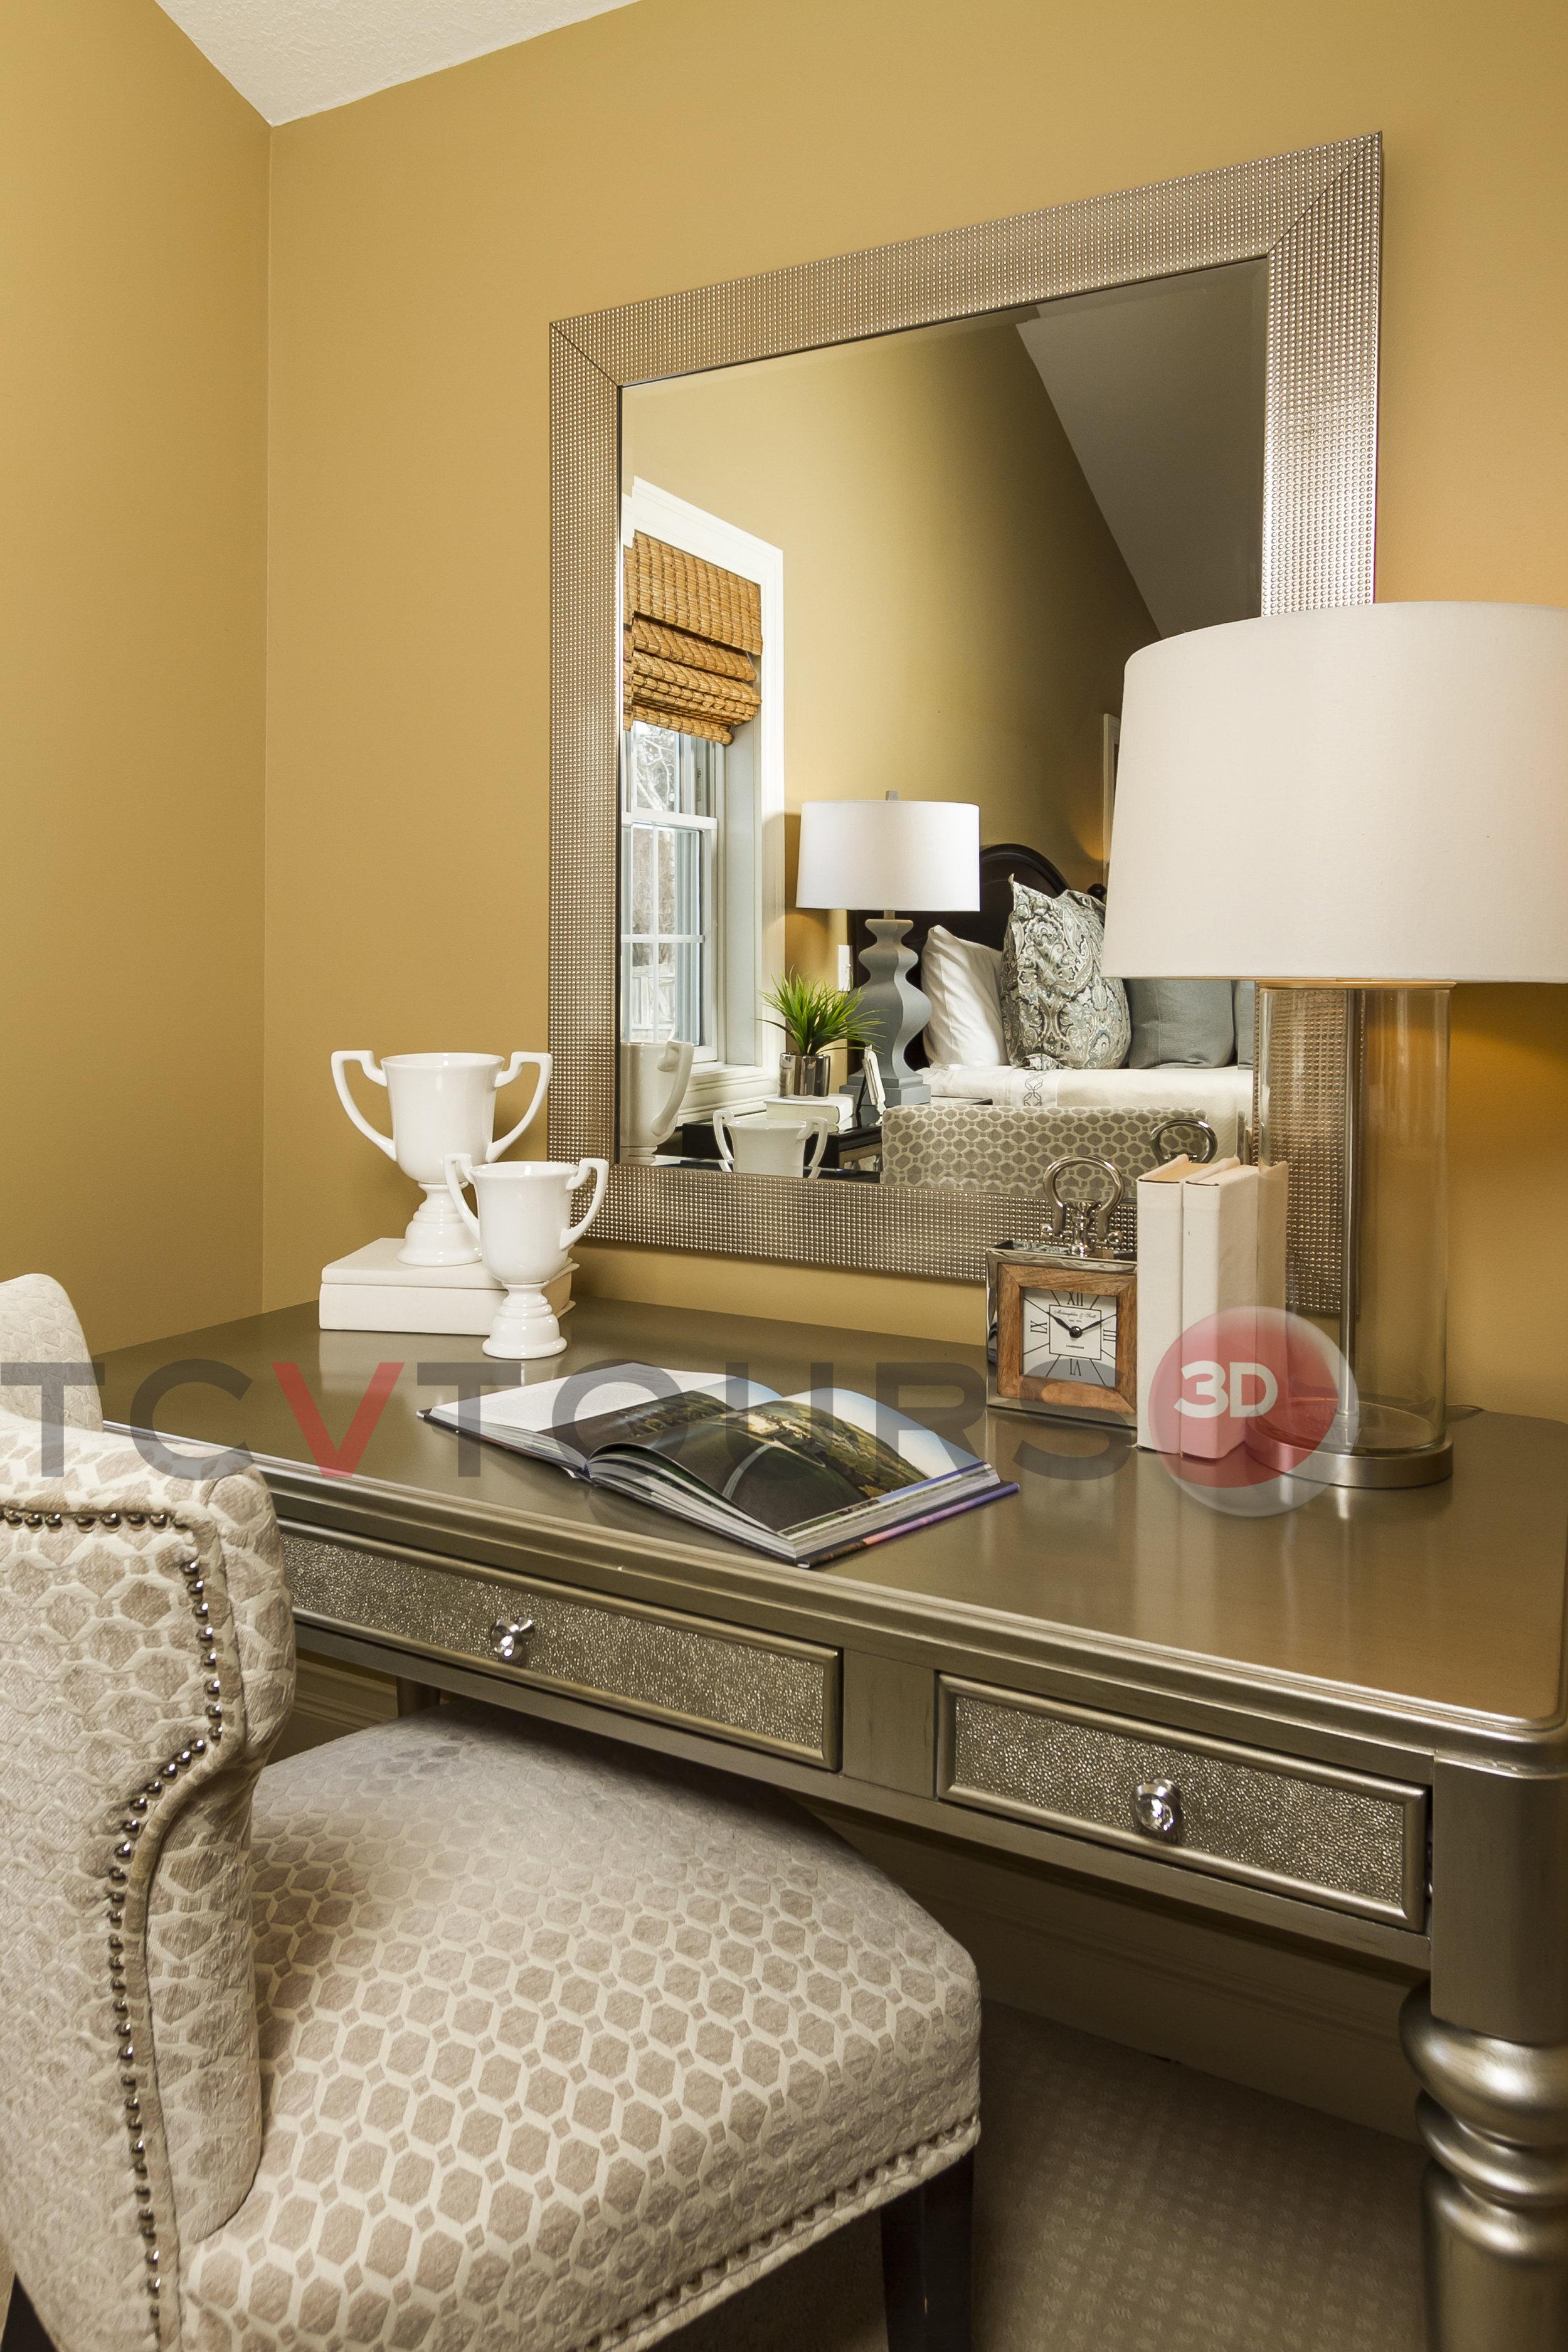 029_bedroom master desk H20.jpg